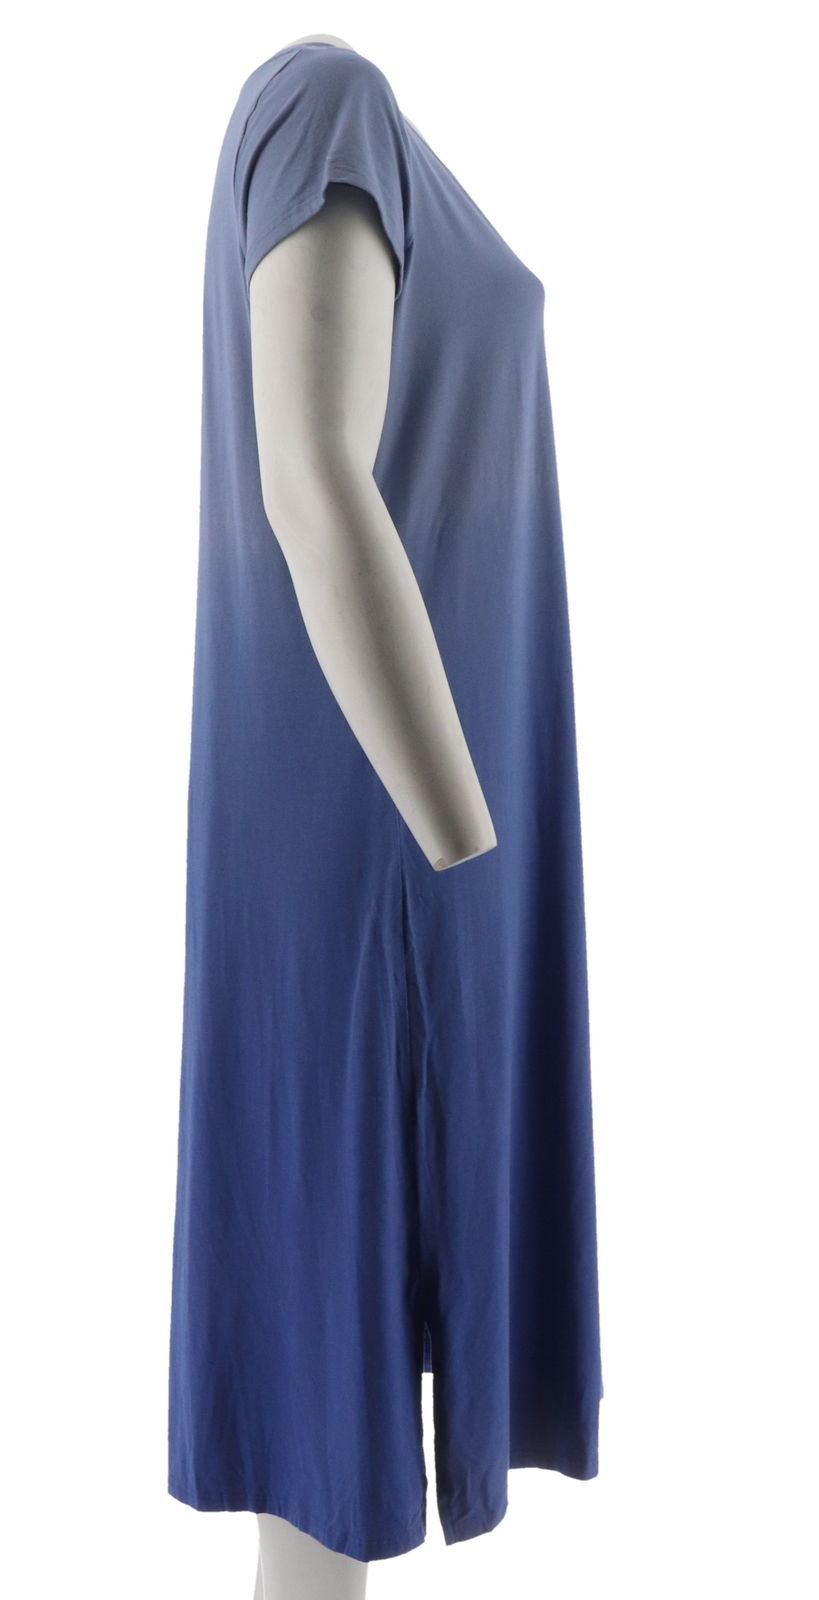 H Halston Short Slv Dip Dye Knit Midi Dress Purple Iris S NEW A289380 image 4